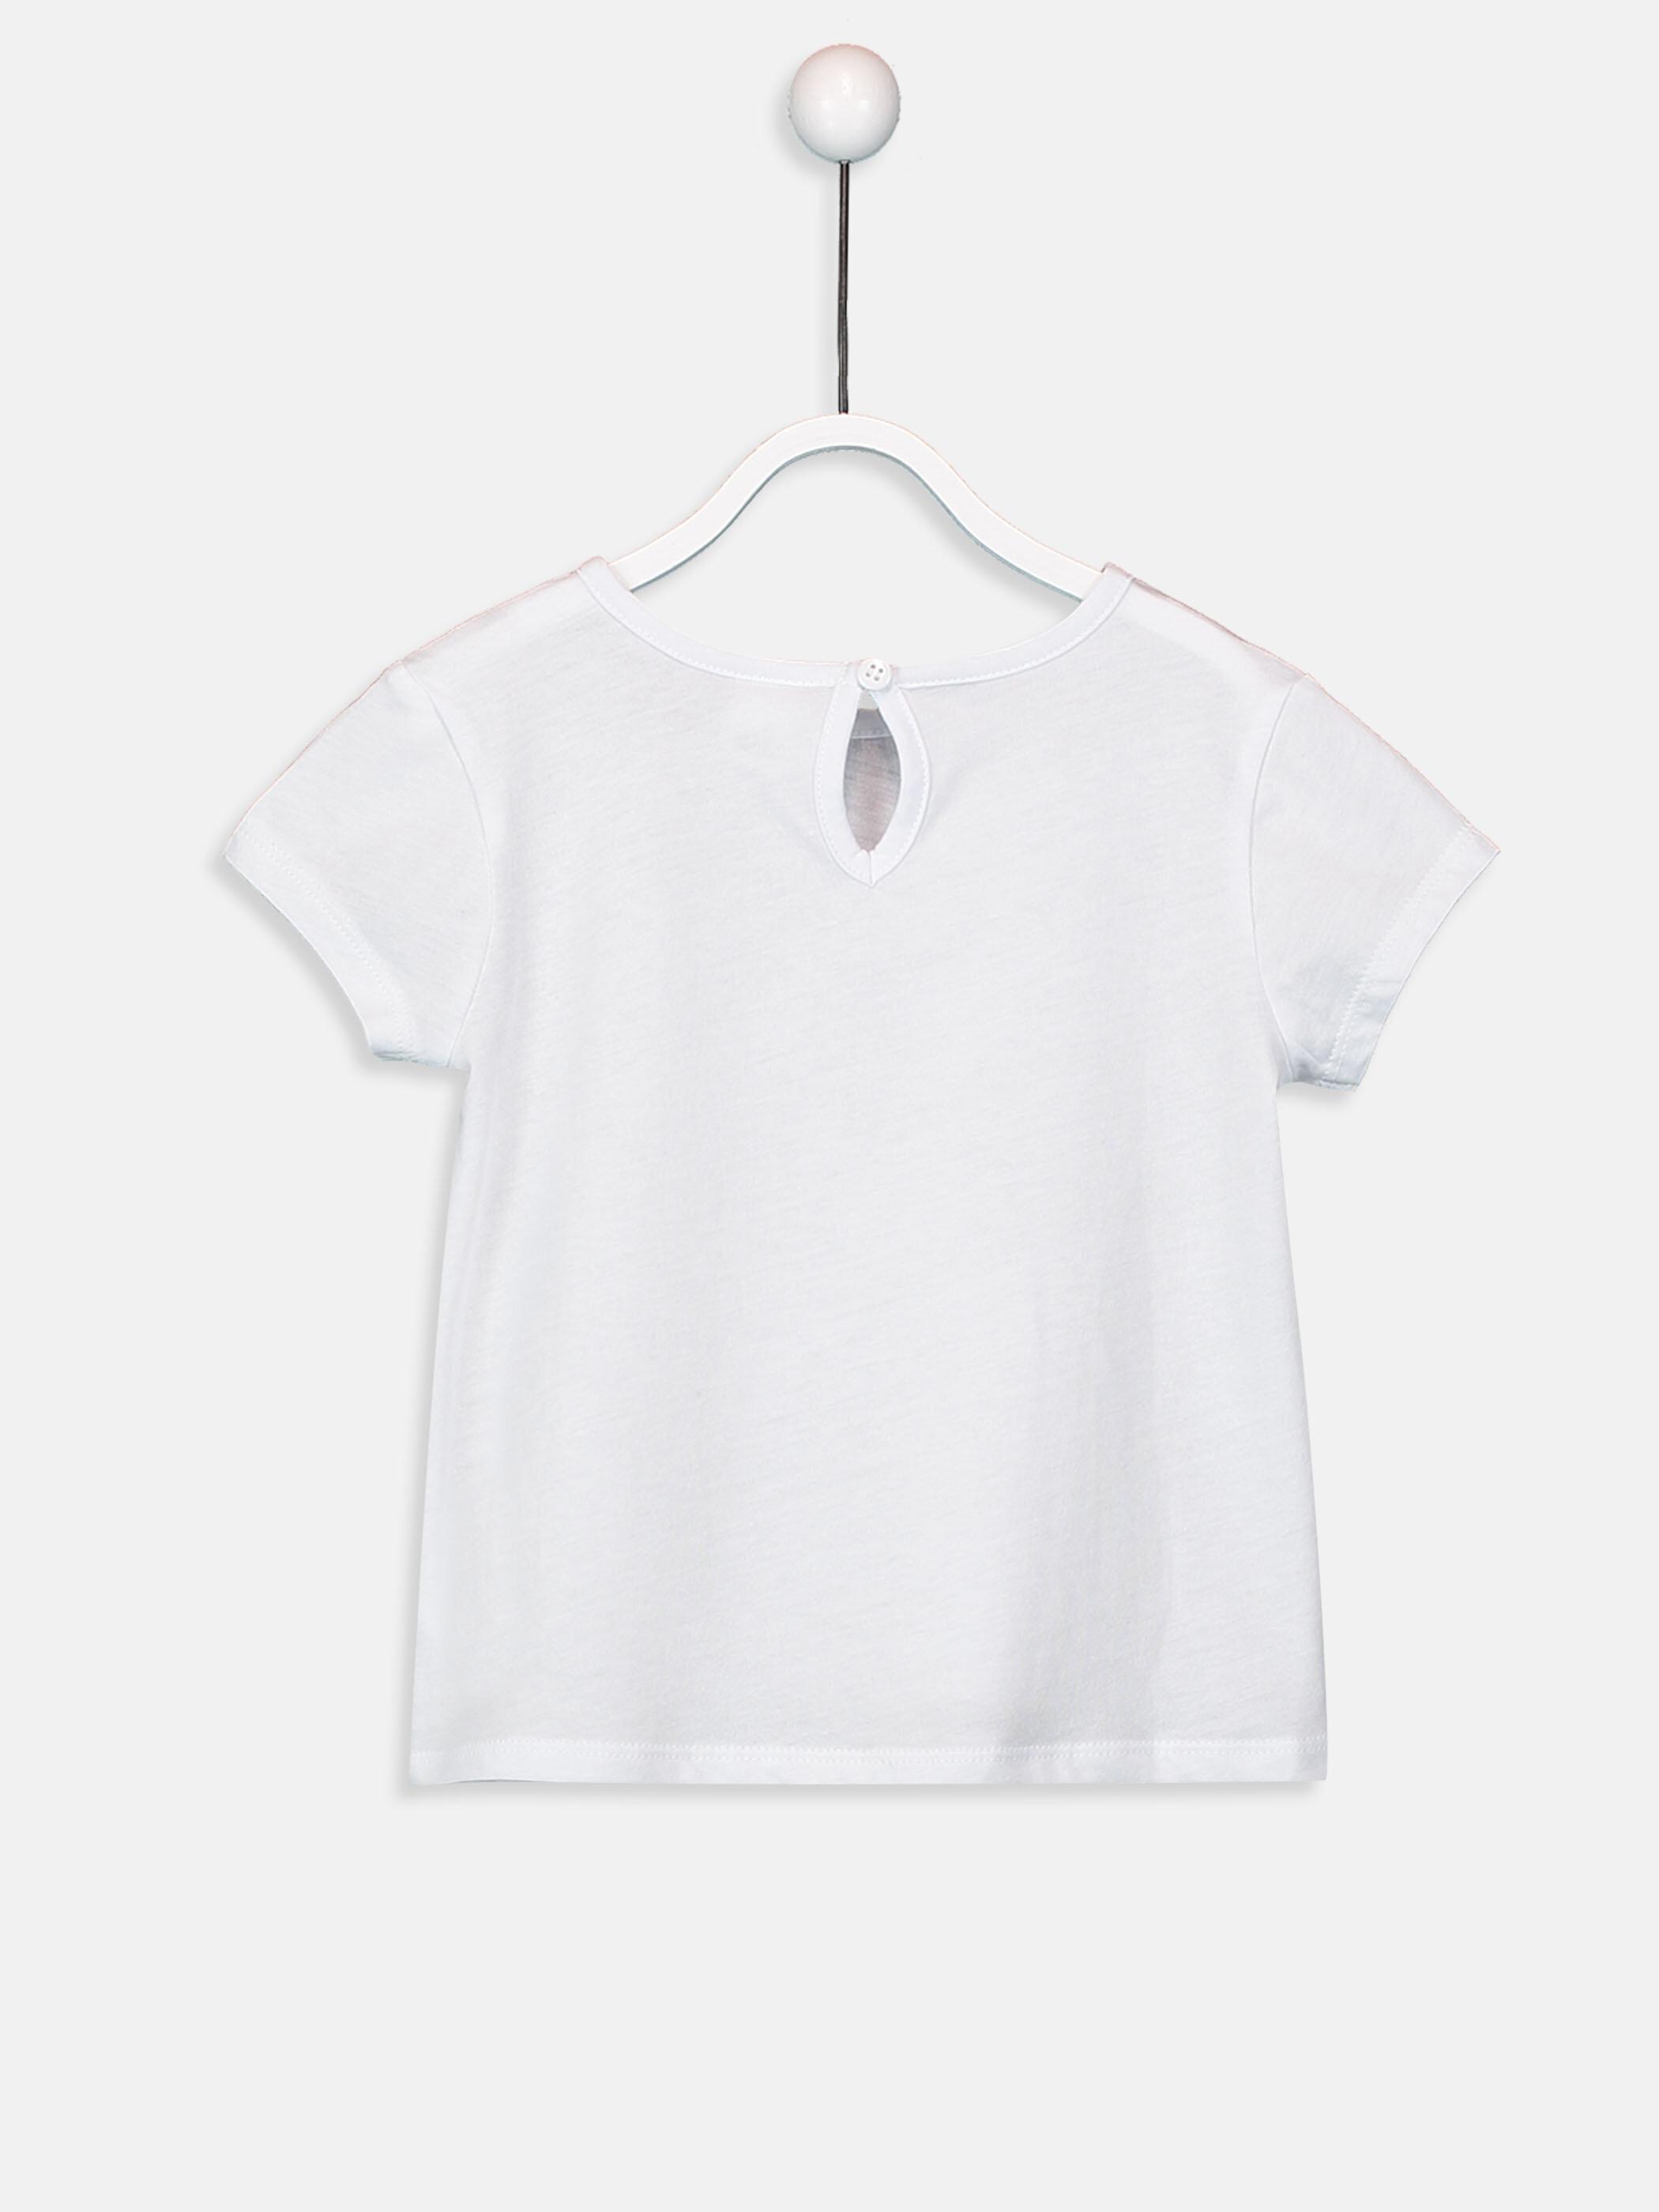 Kız Bebek Baskılı Pamuklu Tişört -9SK553Z1-J5E